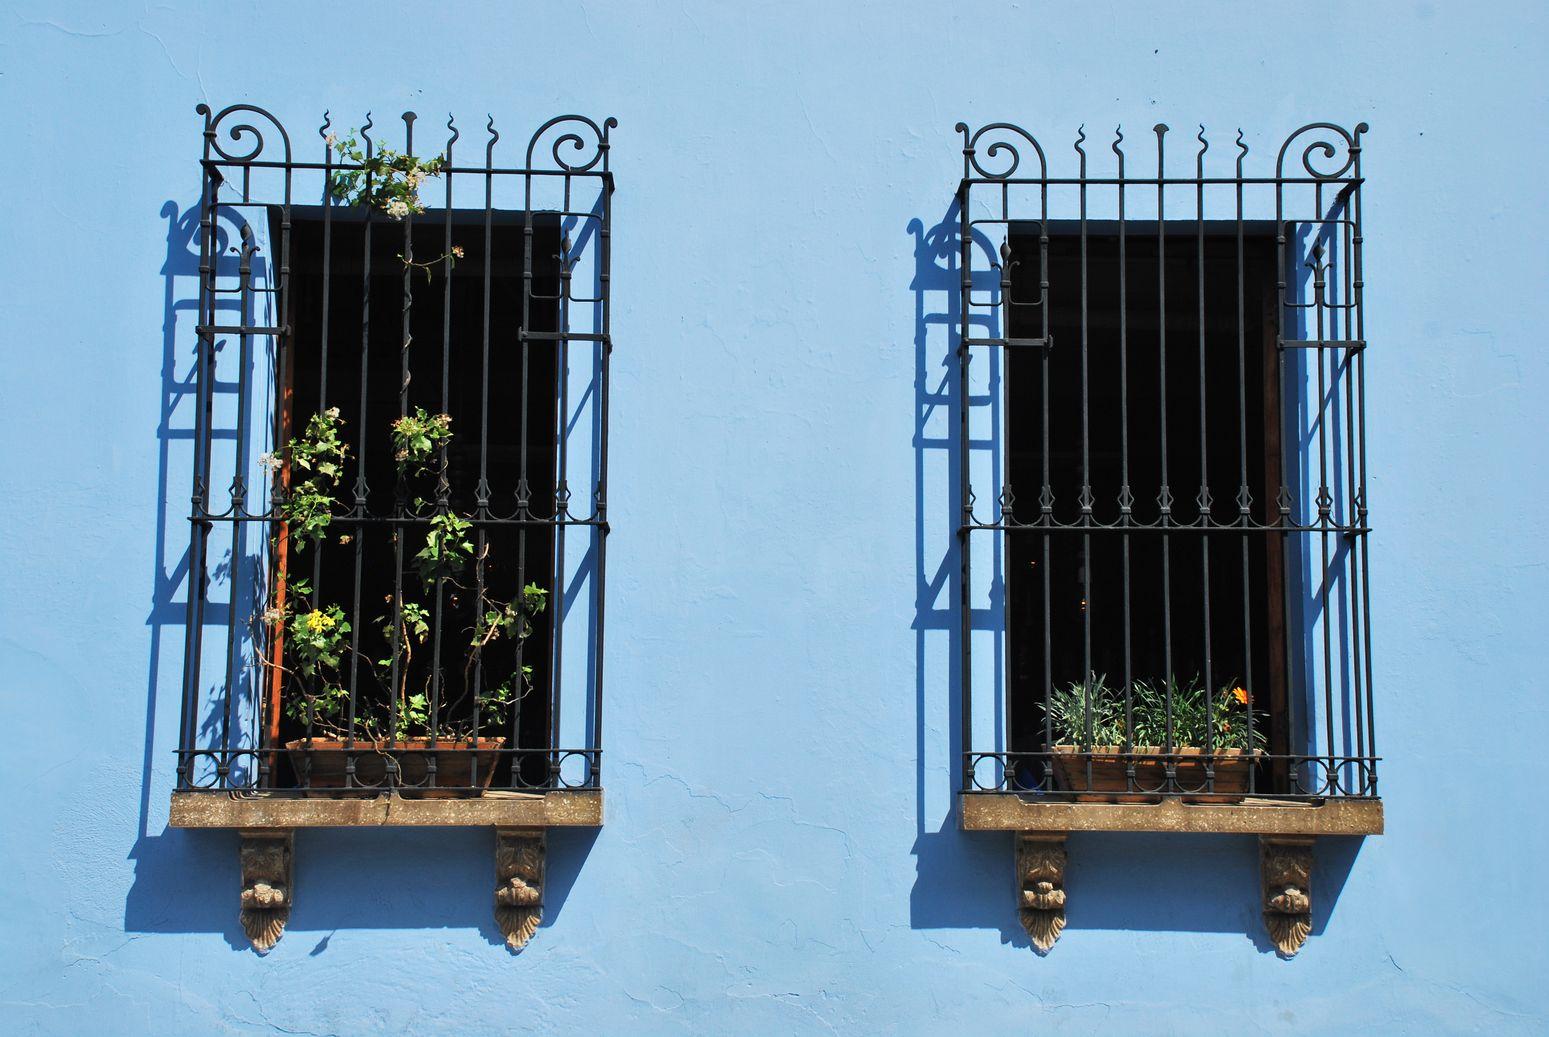 Antigua Guatemala ventana